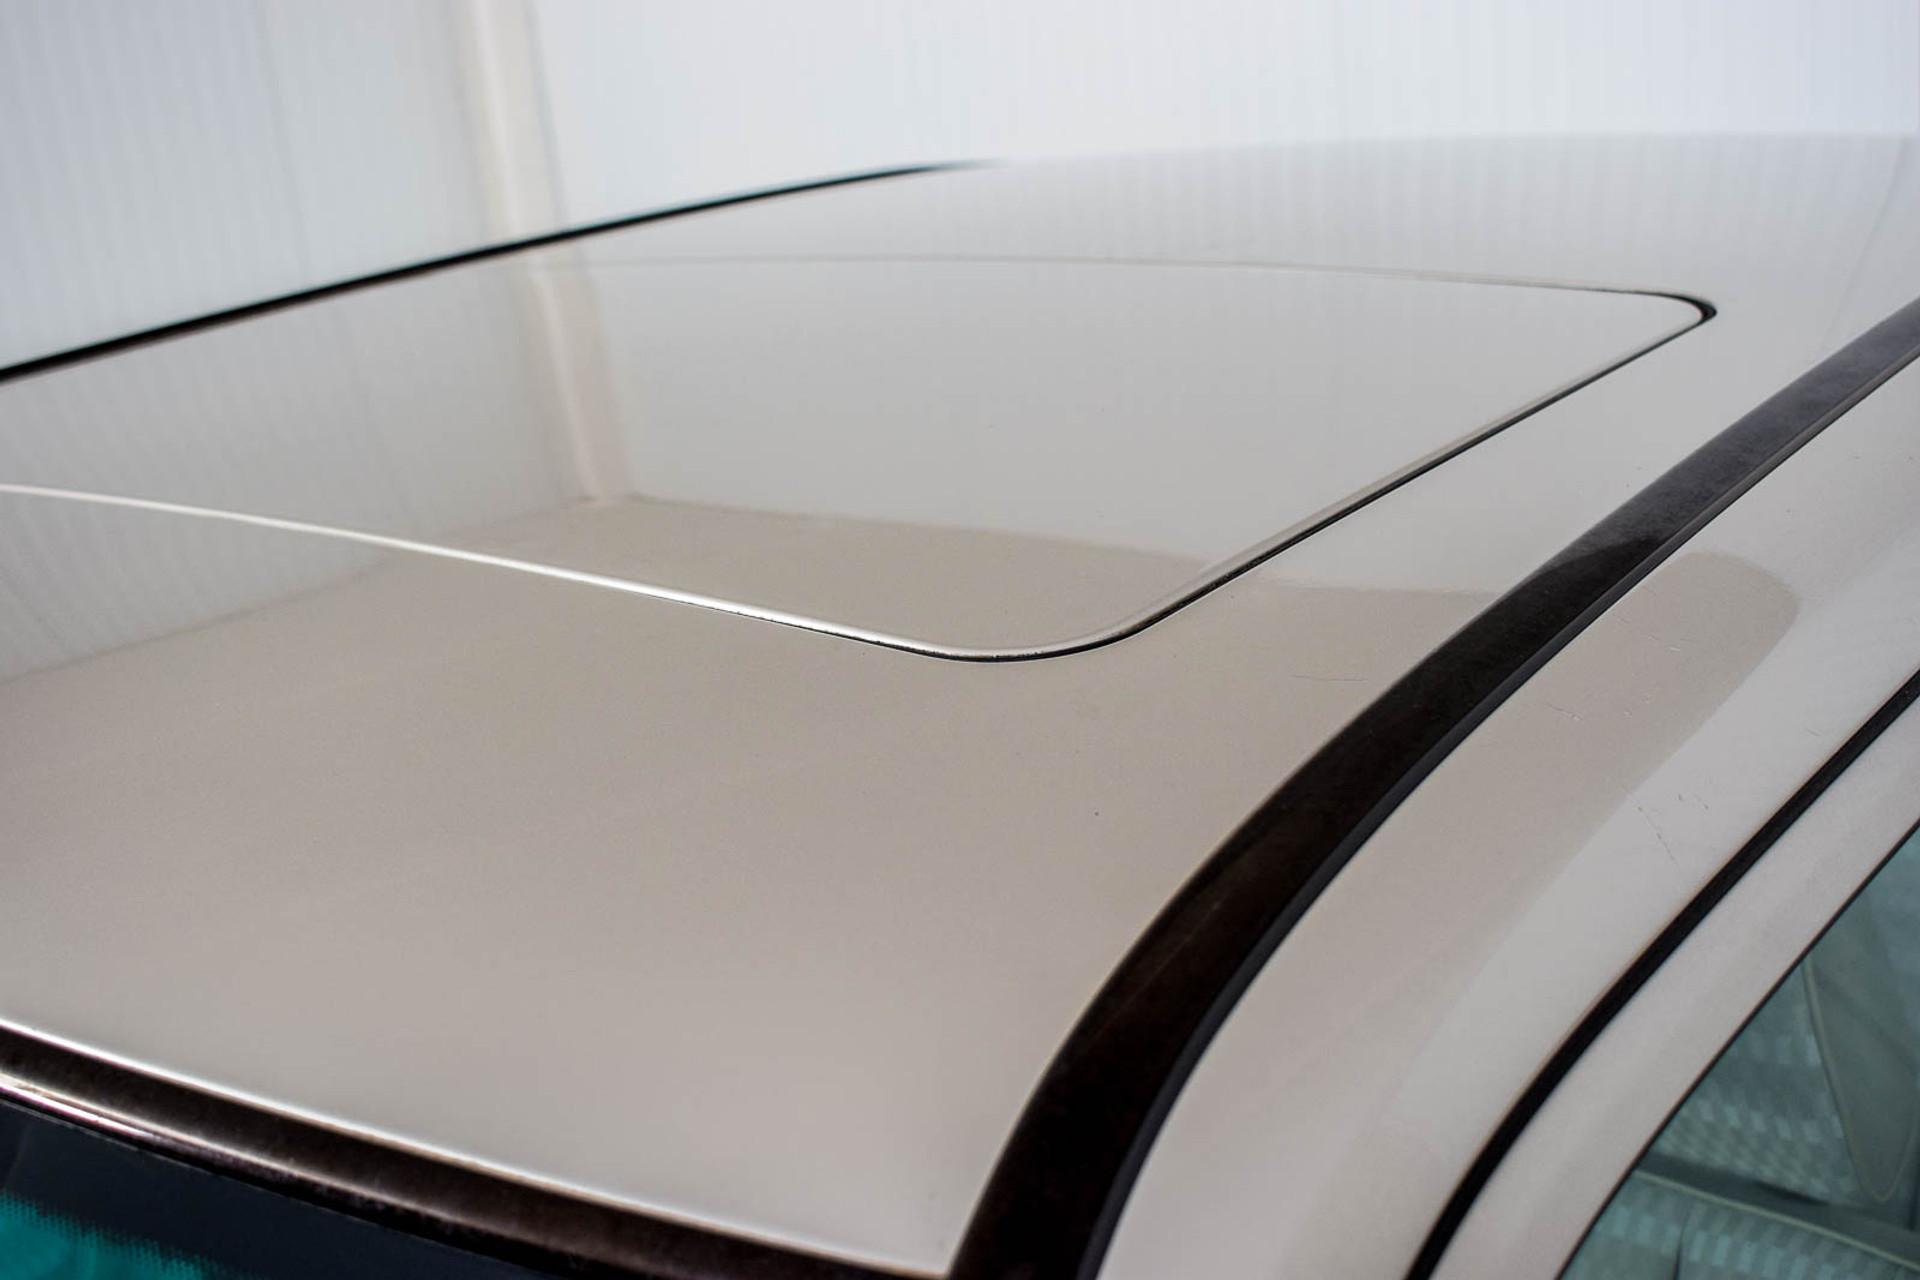 Mercedes-Benz 190 2.5 D Turbo Diesel Foto 26